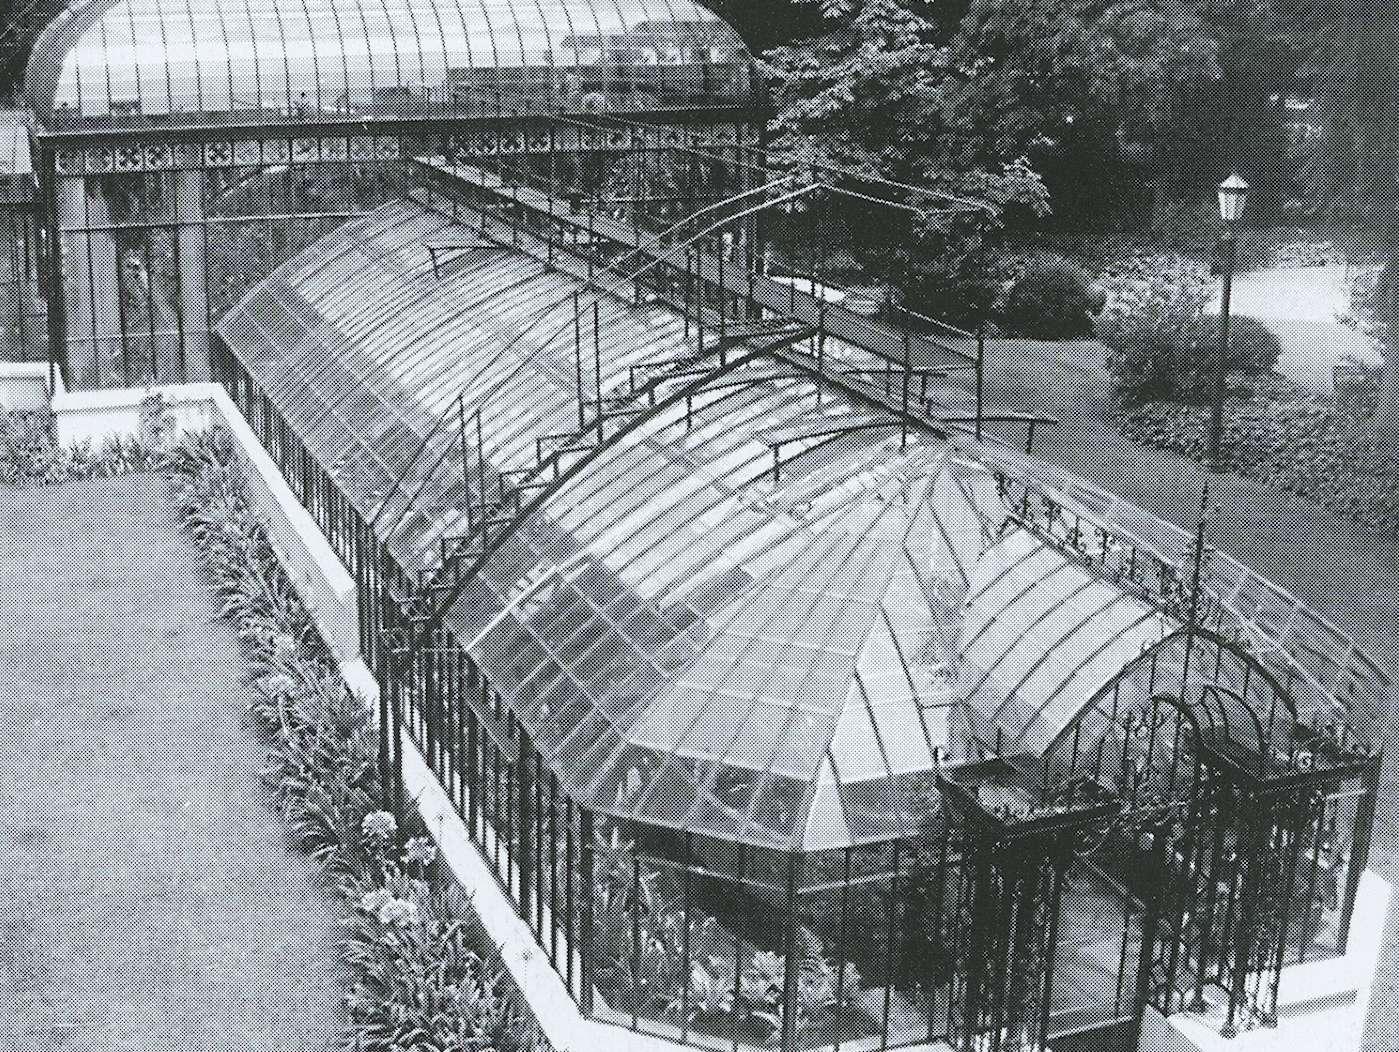 Buenos Aires, serra in ferro e vetro, Orto Botanico